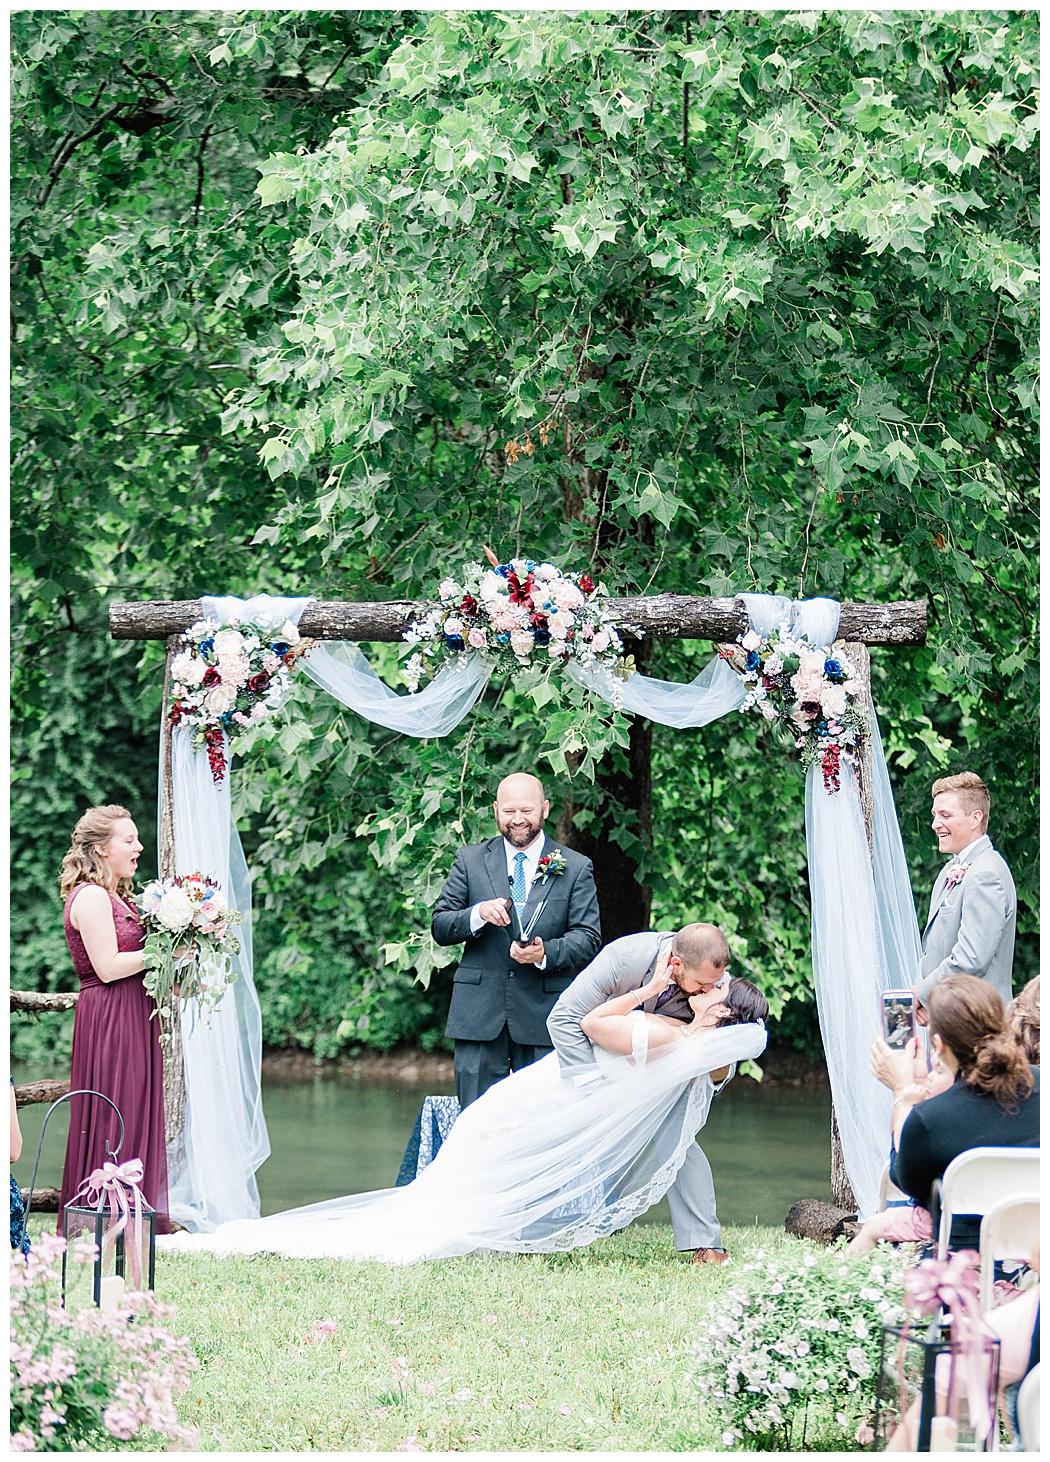 River Uplands Farm Wedding | Virginia Wedding Photographer